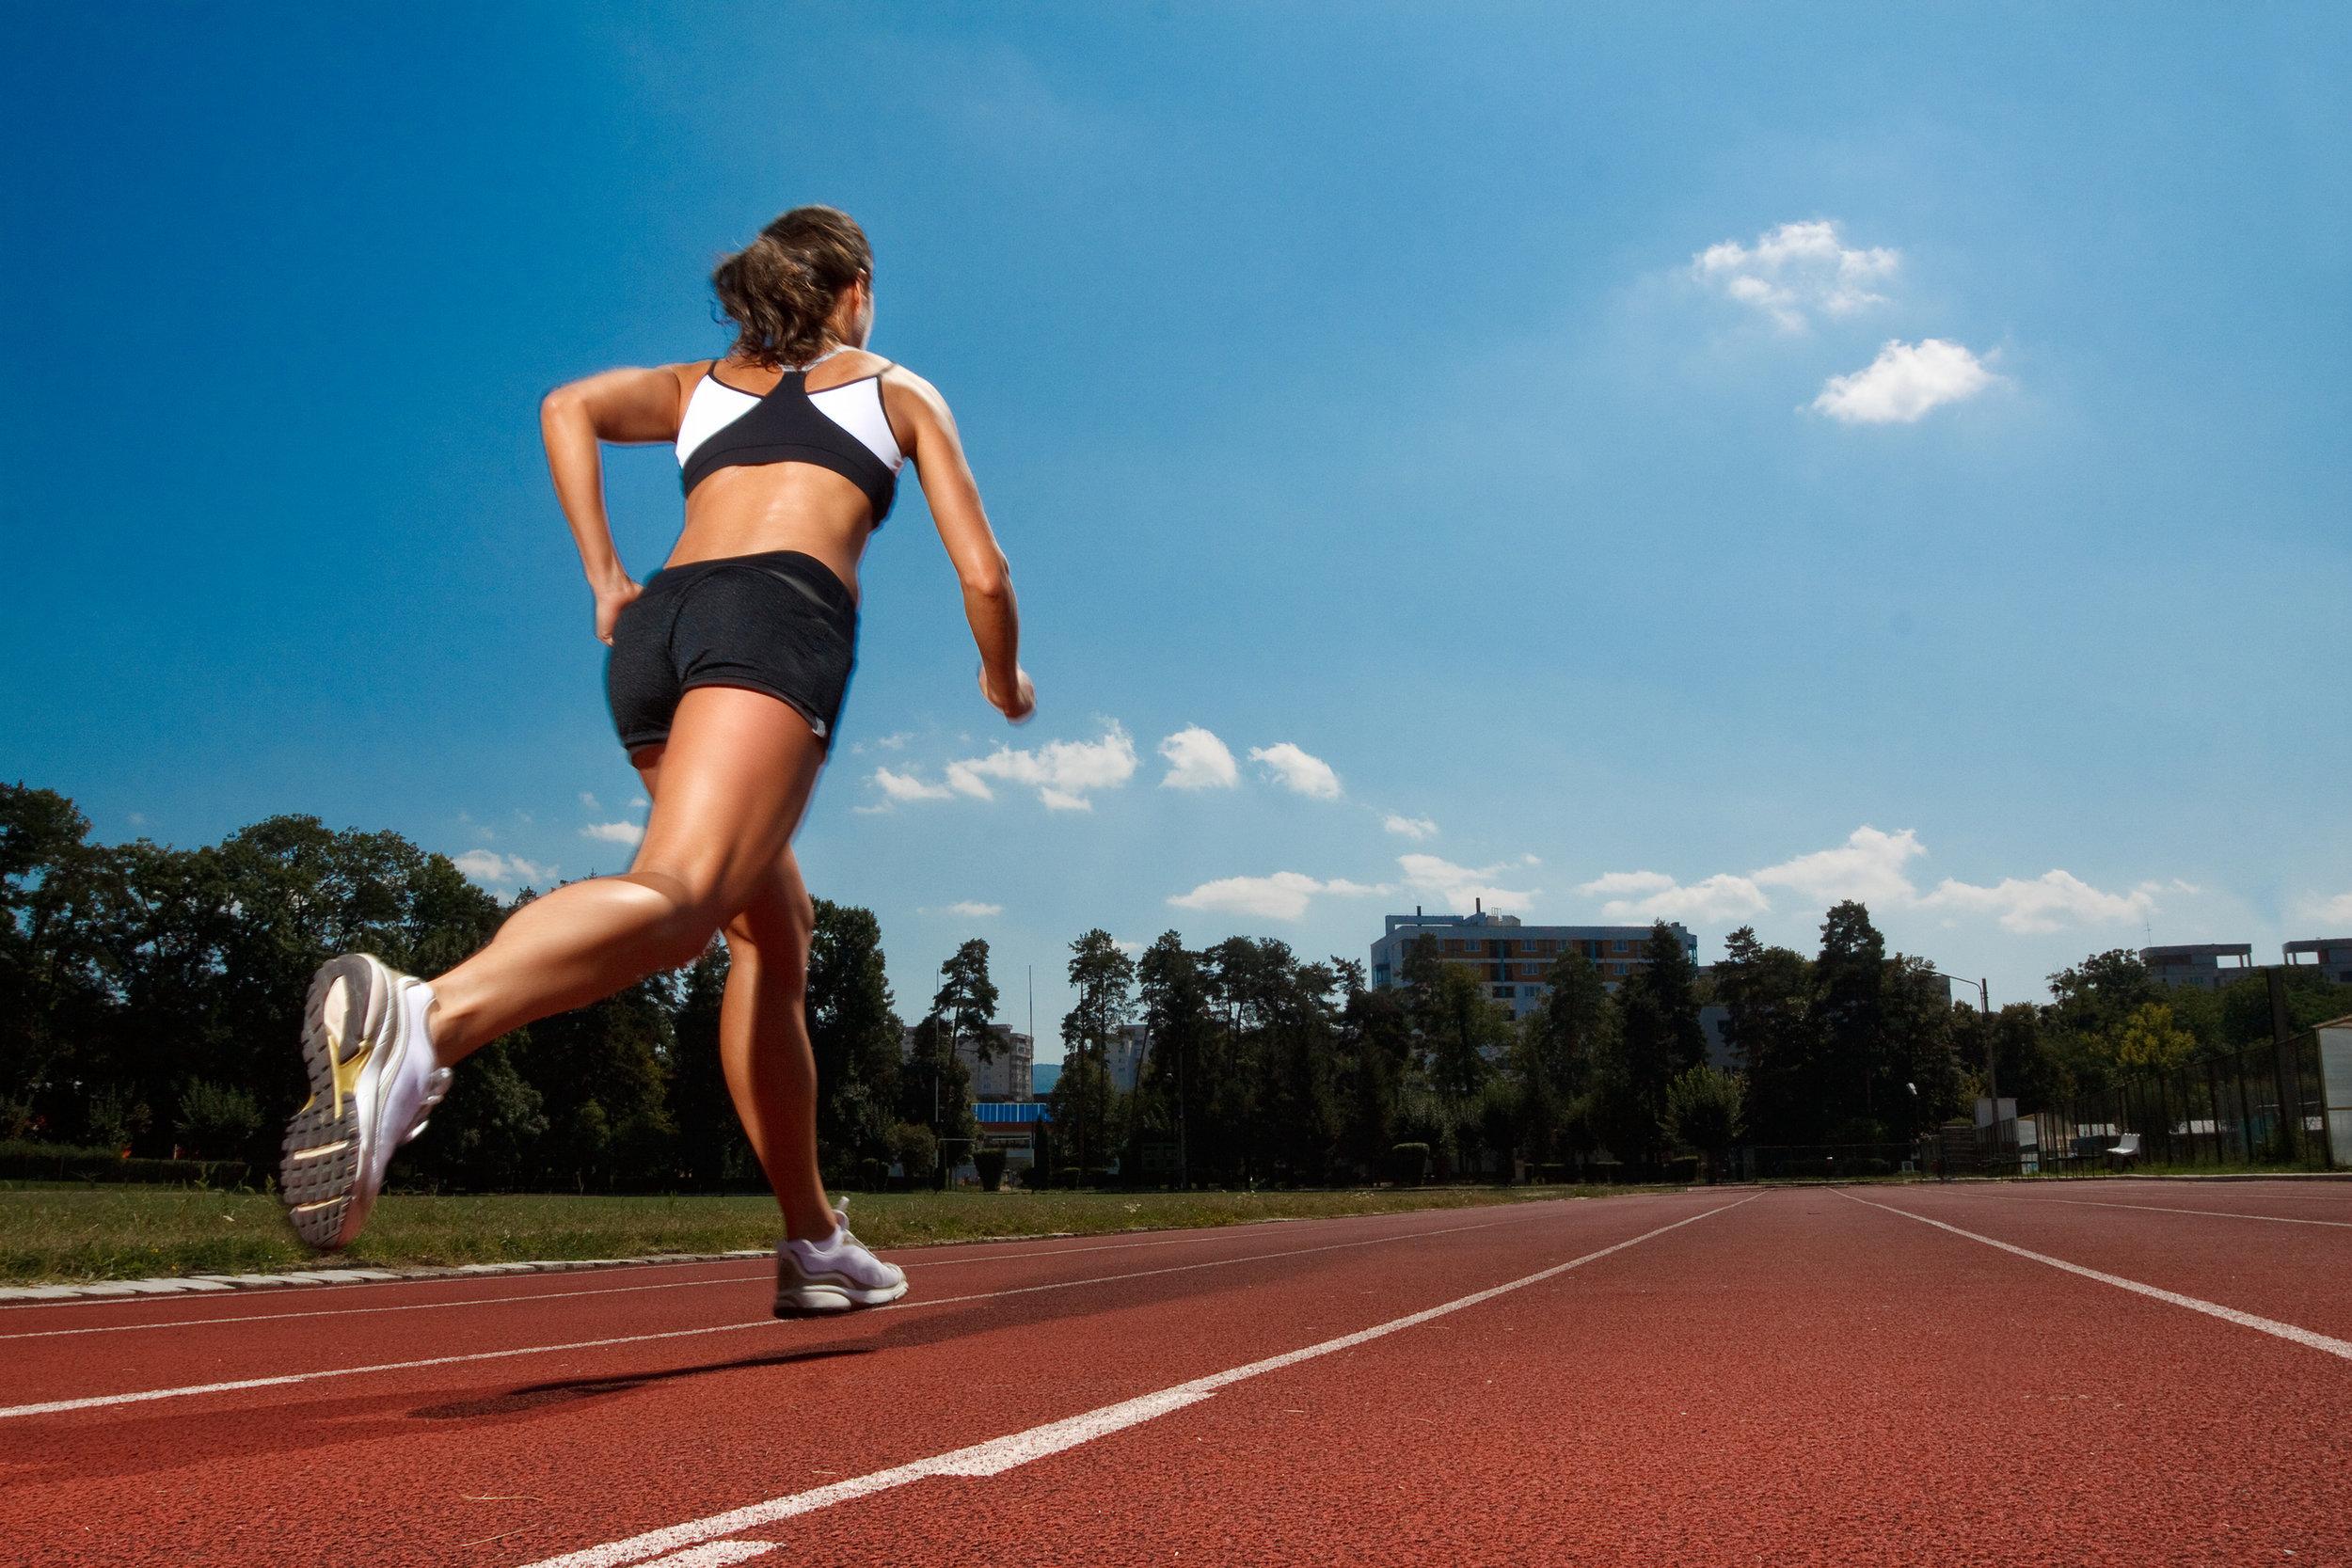 bigstock-Athletic-woman-running-on-trac-19463858.jpg